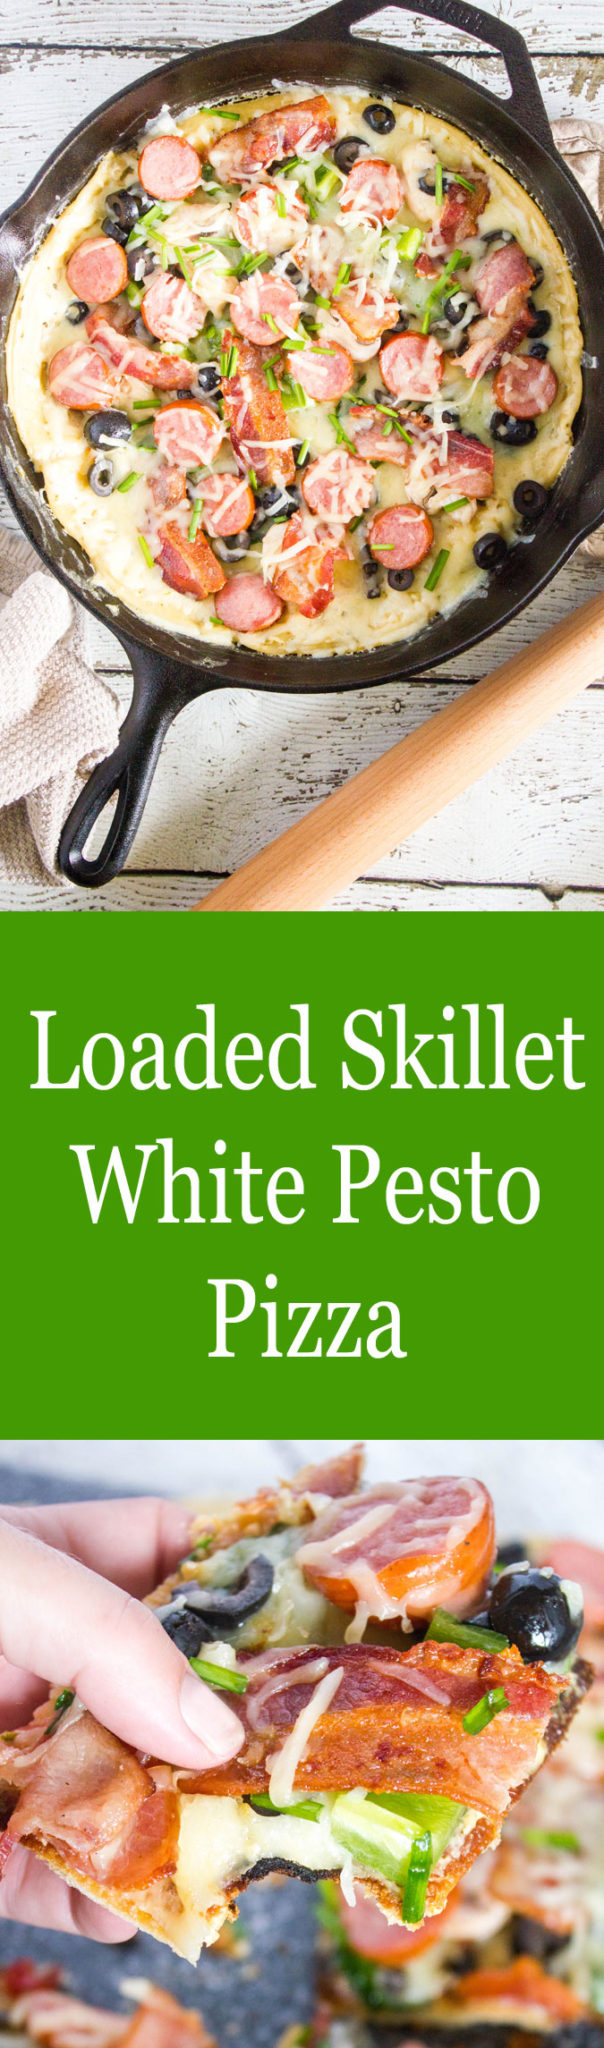 Loaded Skillet White Pesto Pizza #SundaySupper #SkilletMeals #SkilletDinner #SkilletPizza YUM! DELICIOUS!!